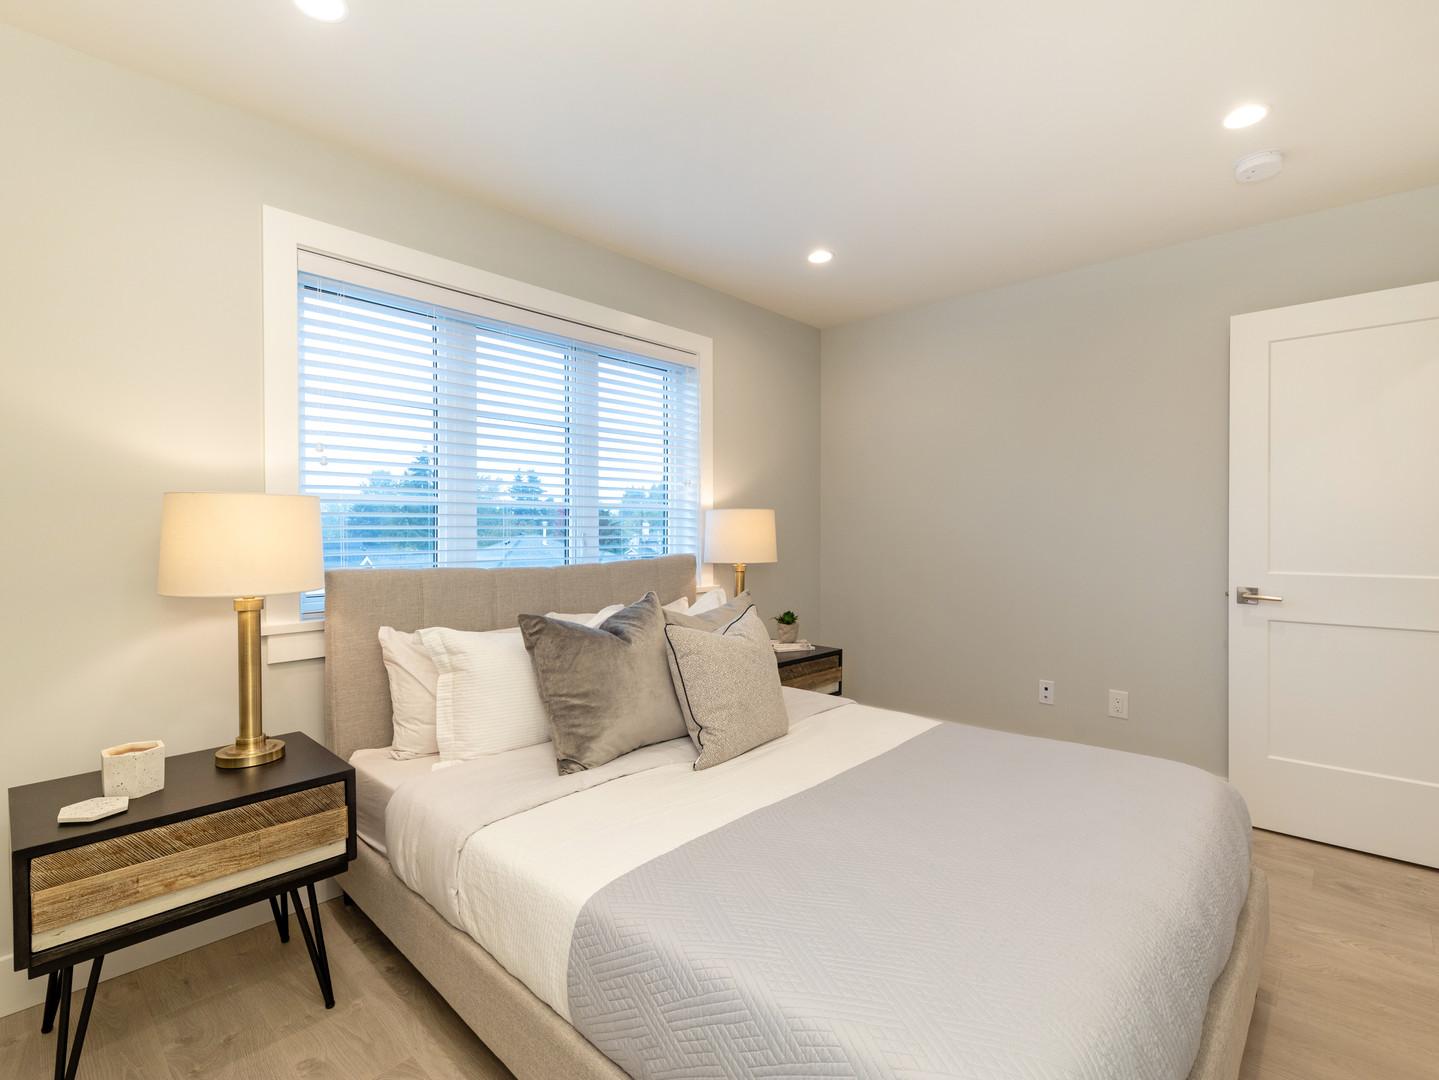 Master Bedroom in Villa Bleu Townhome